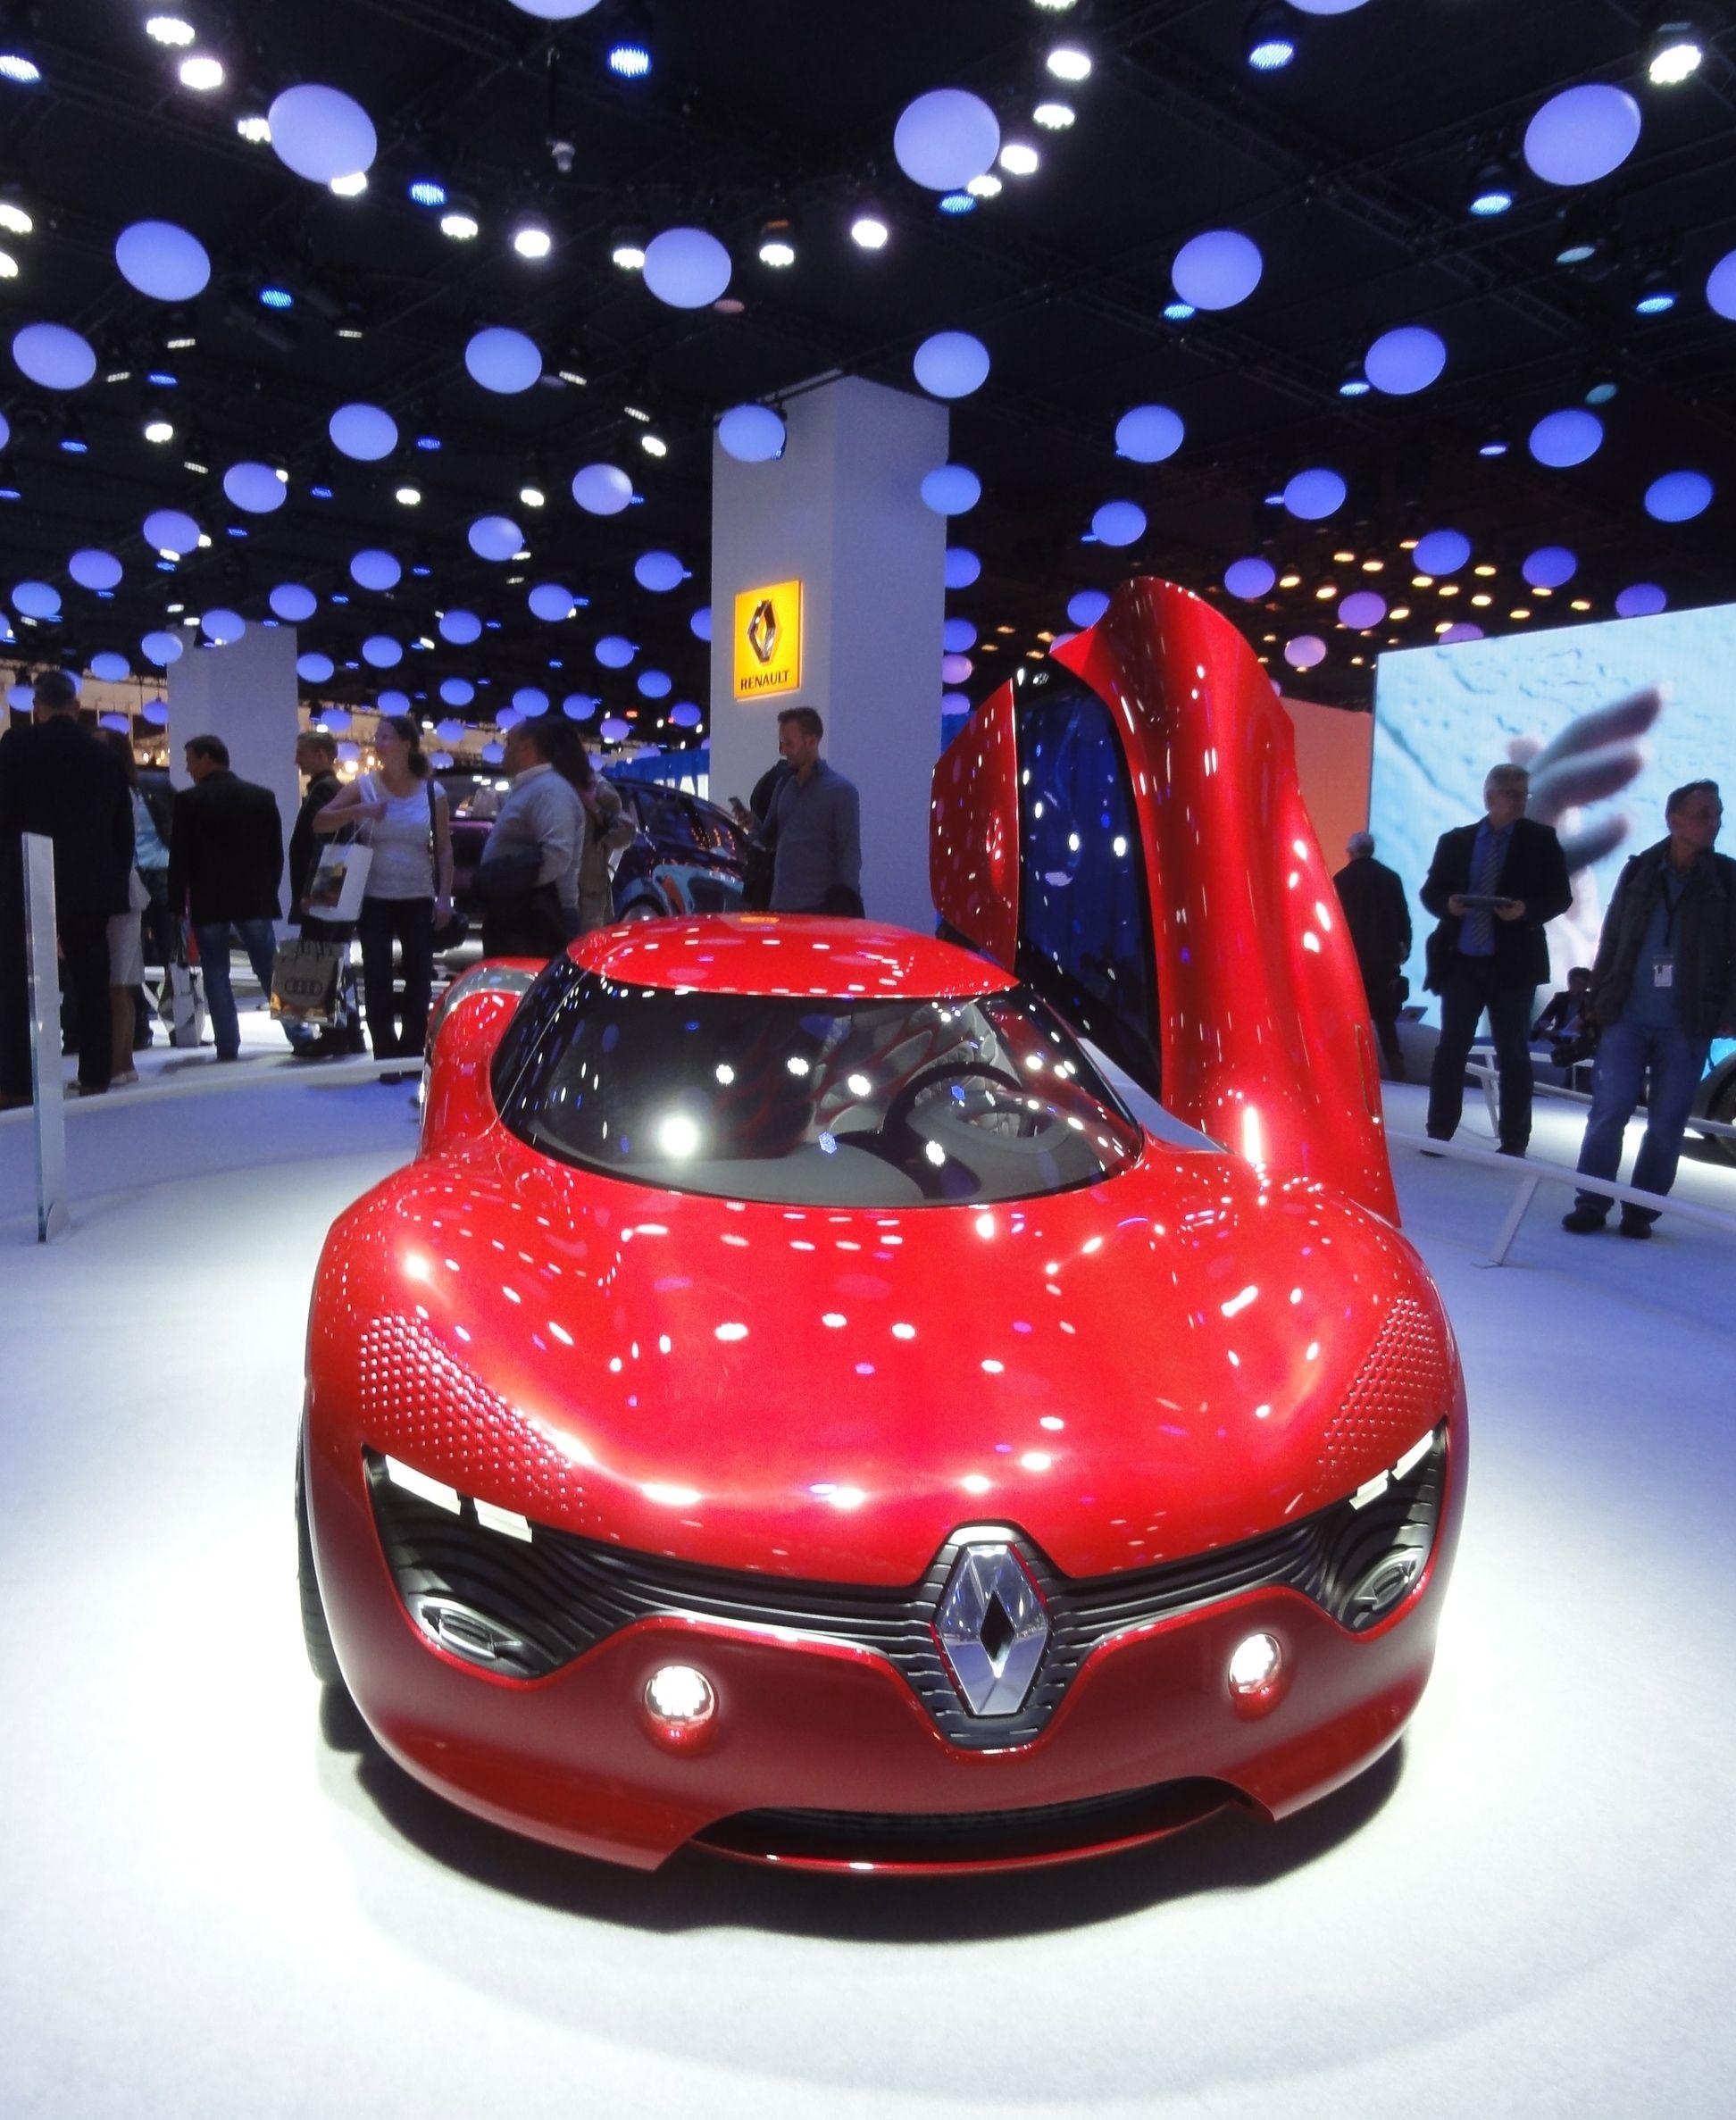 Renault DeZir Concept Car Exhibited At The 2013 Frankfurt